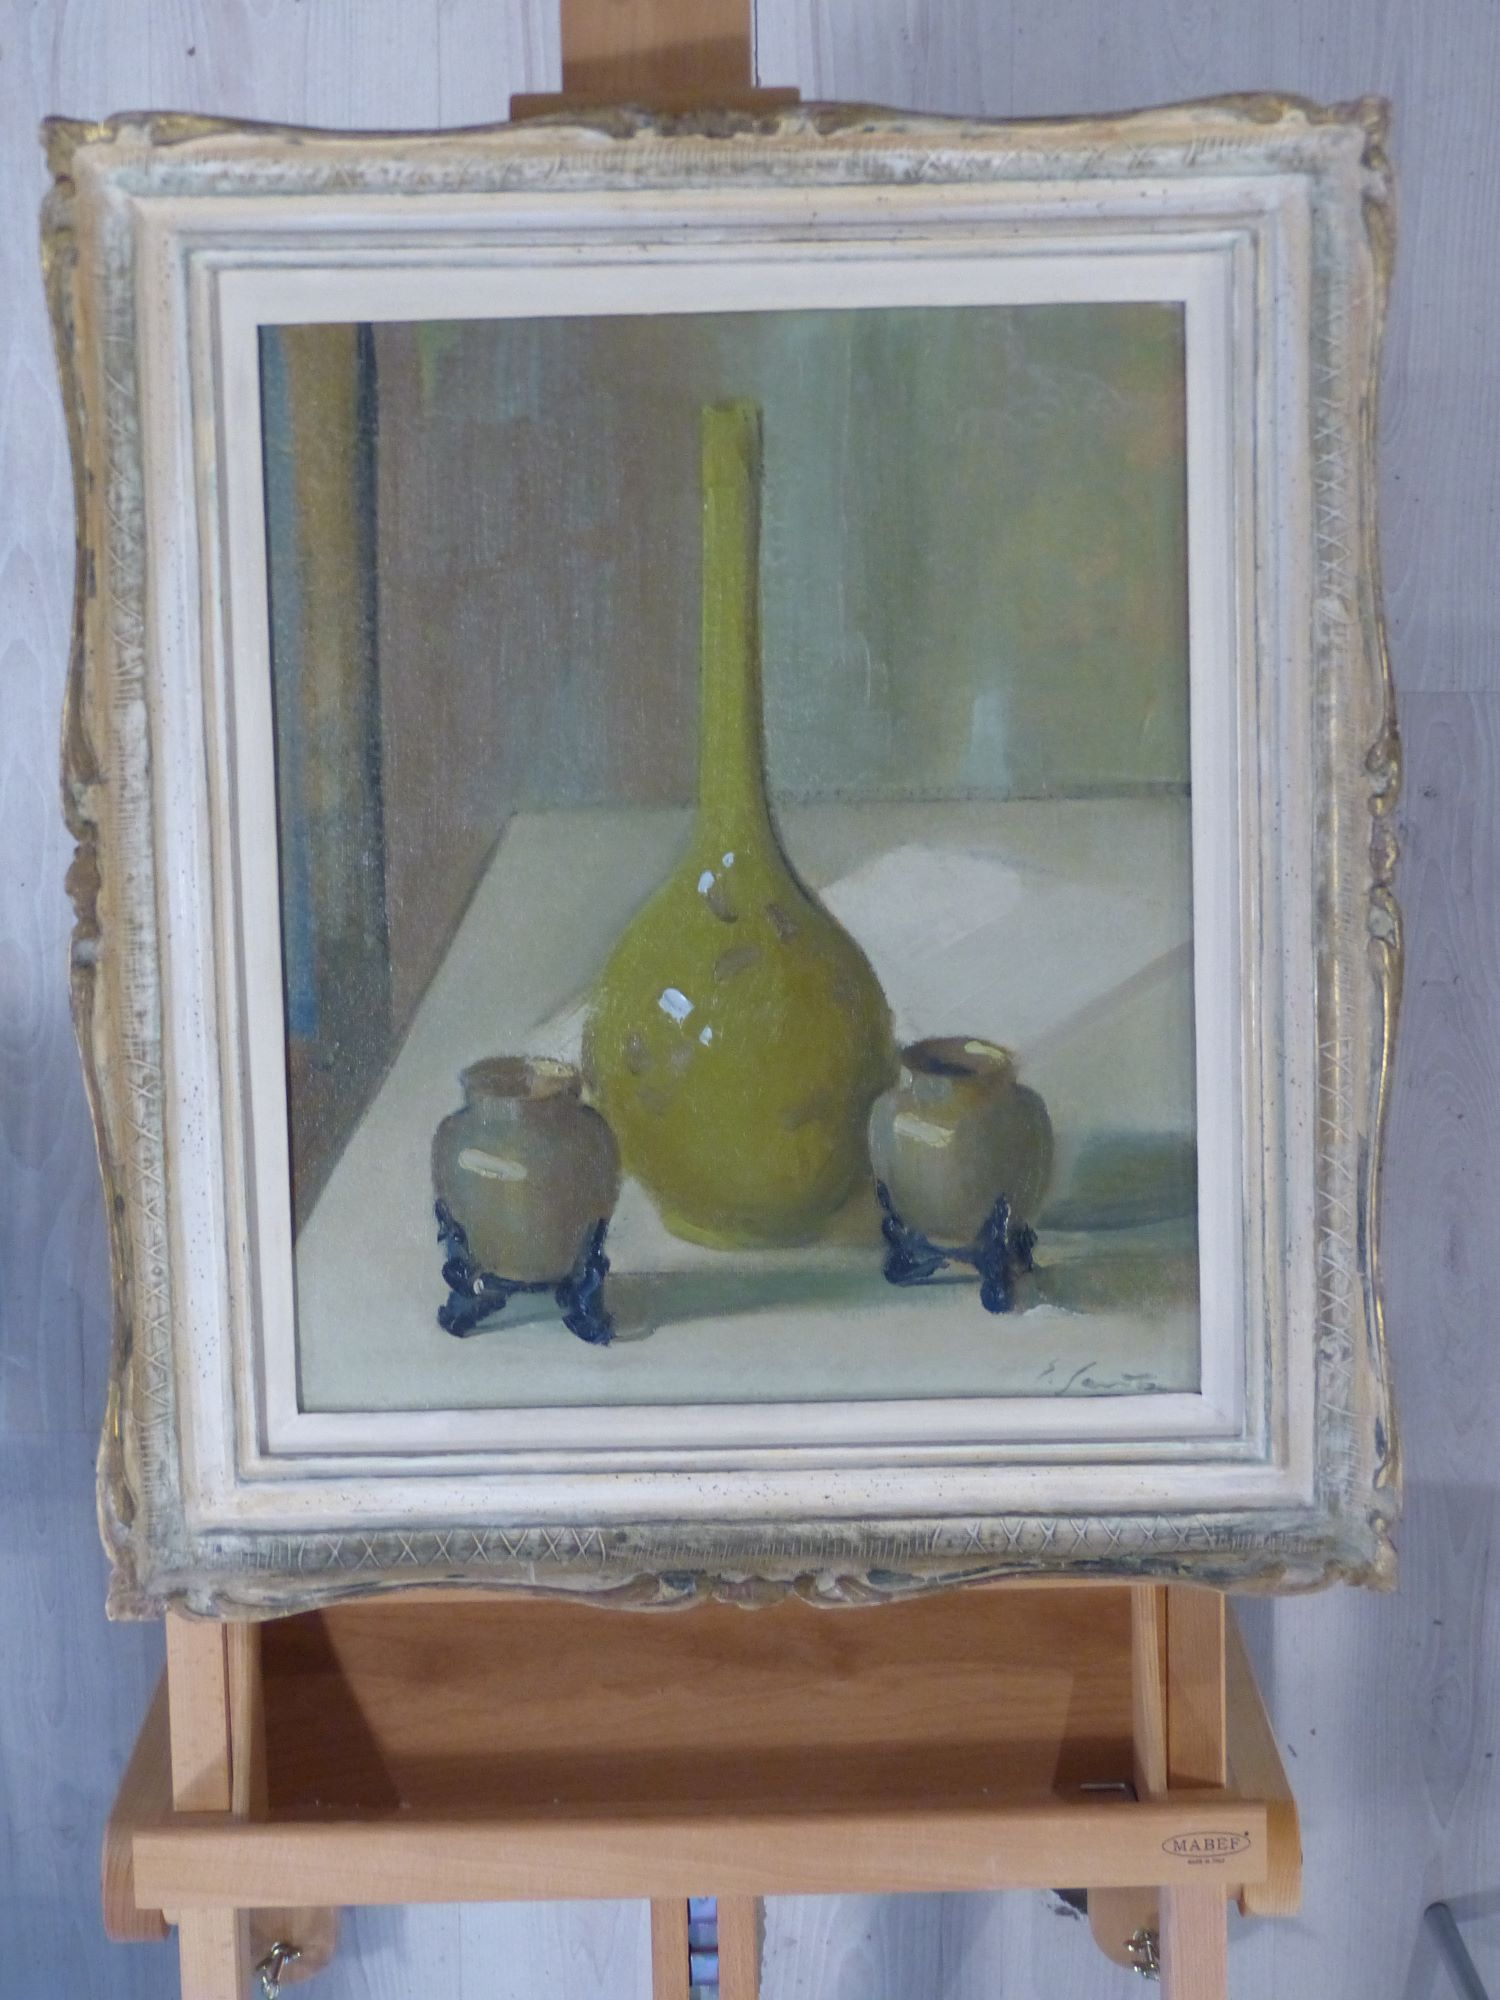 Edgardo Sambo Cappelletti, Vasi cinesi, olio su cartone, 1945 circa, 60x49 cm, inv. 5234